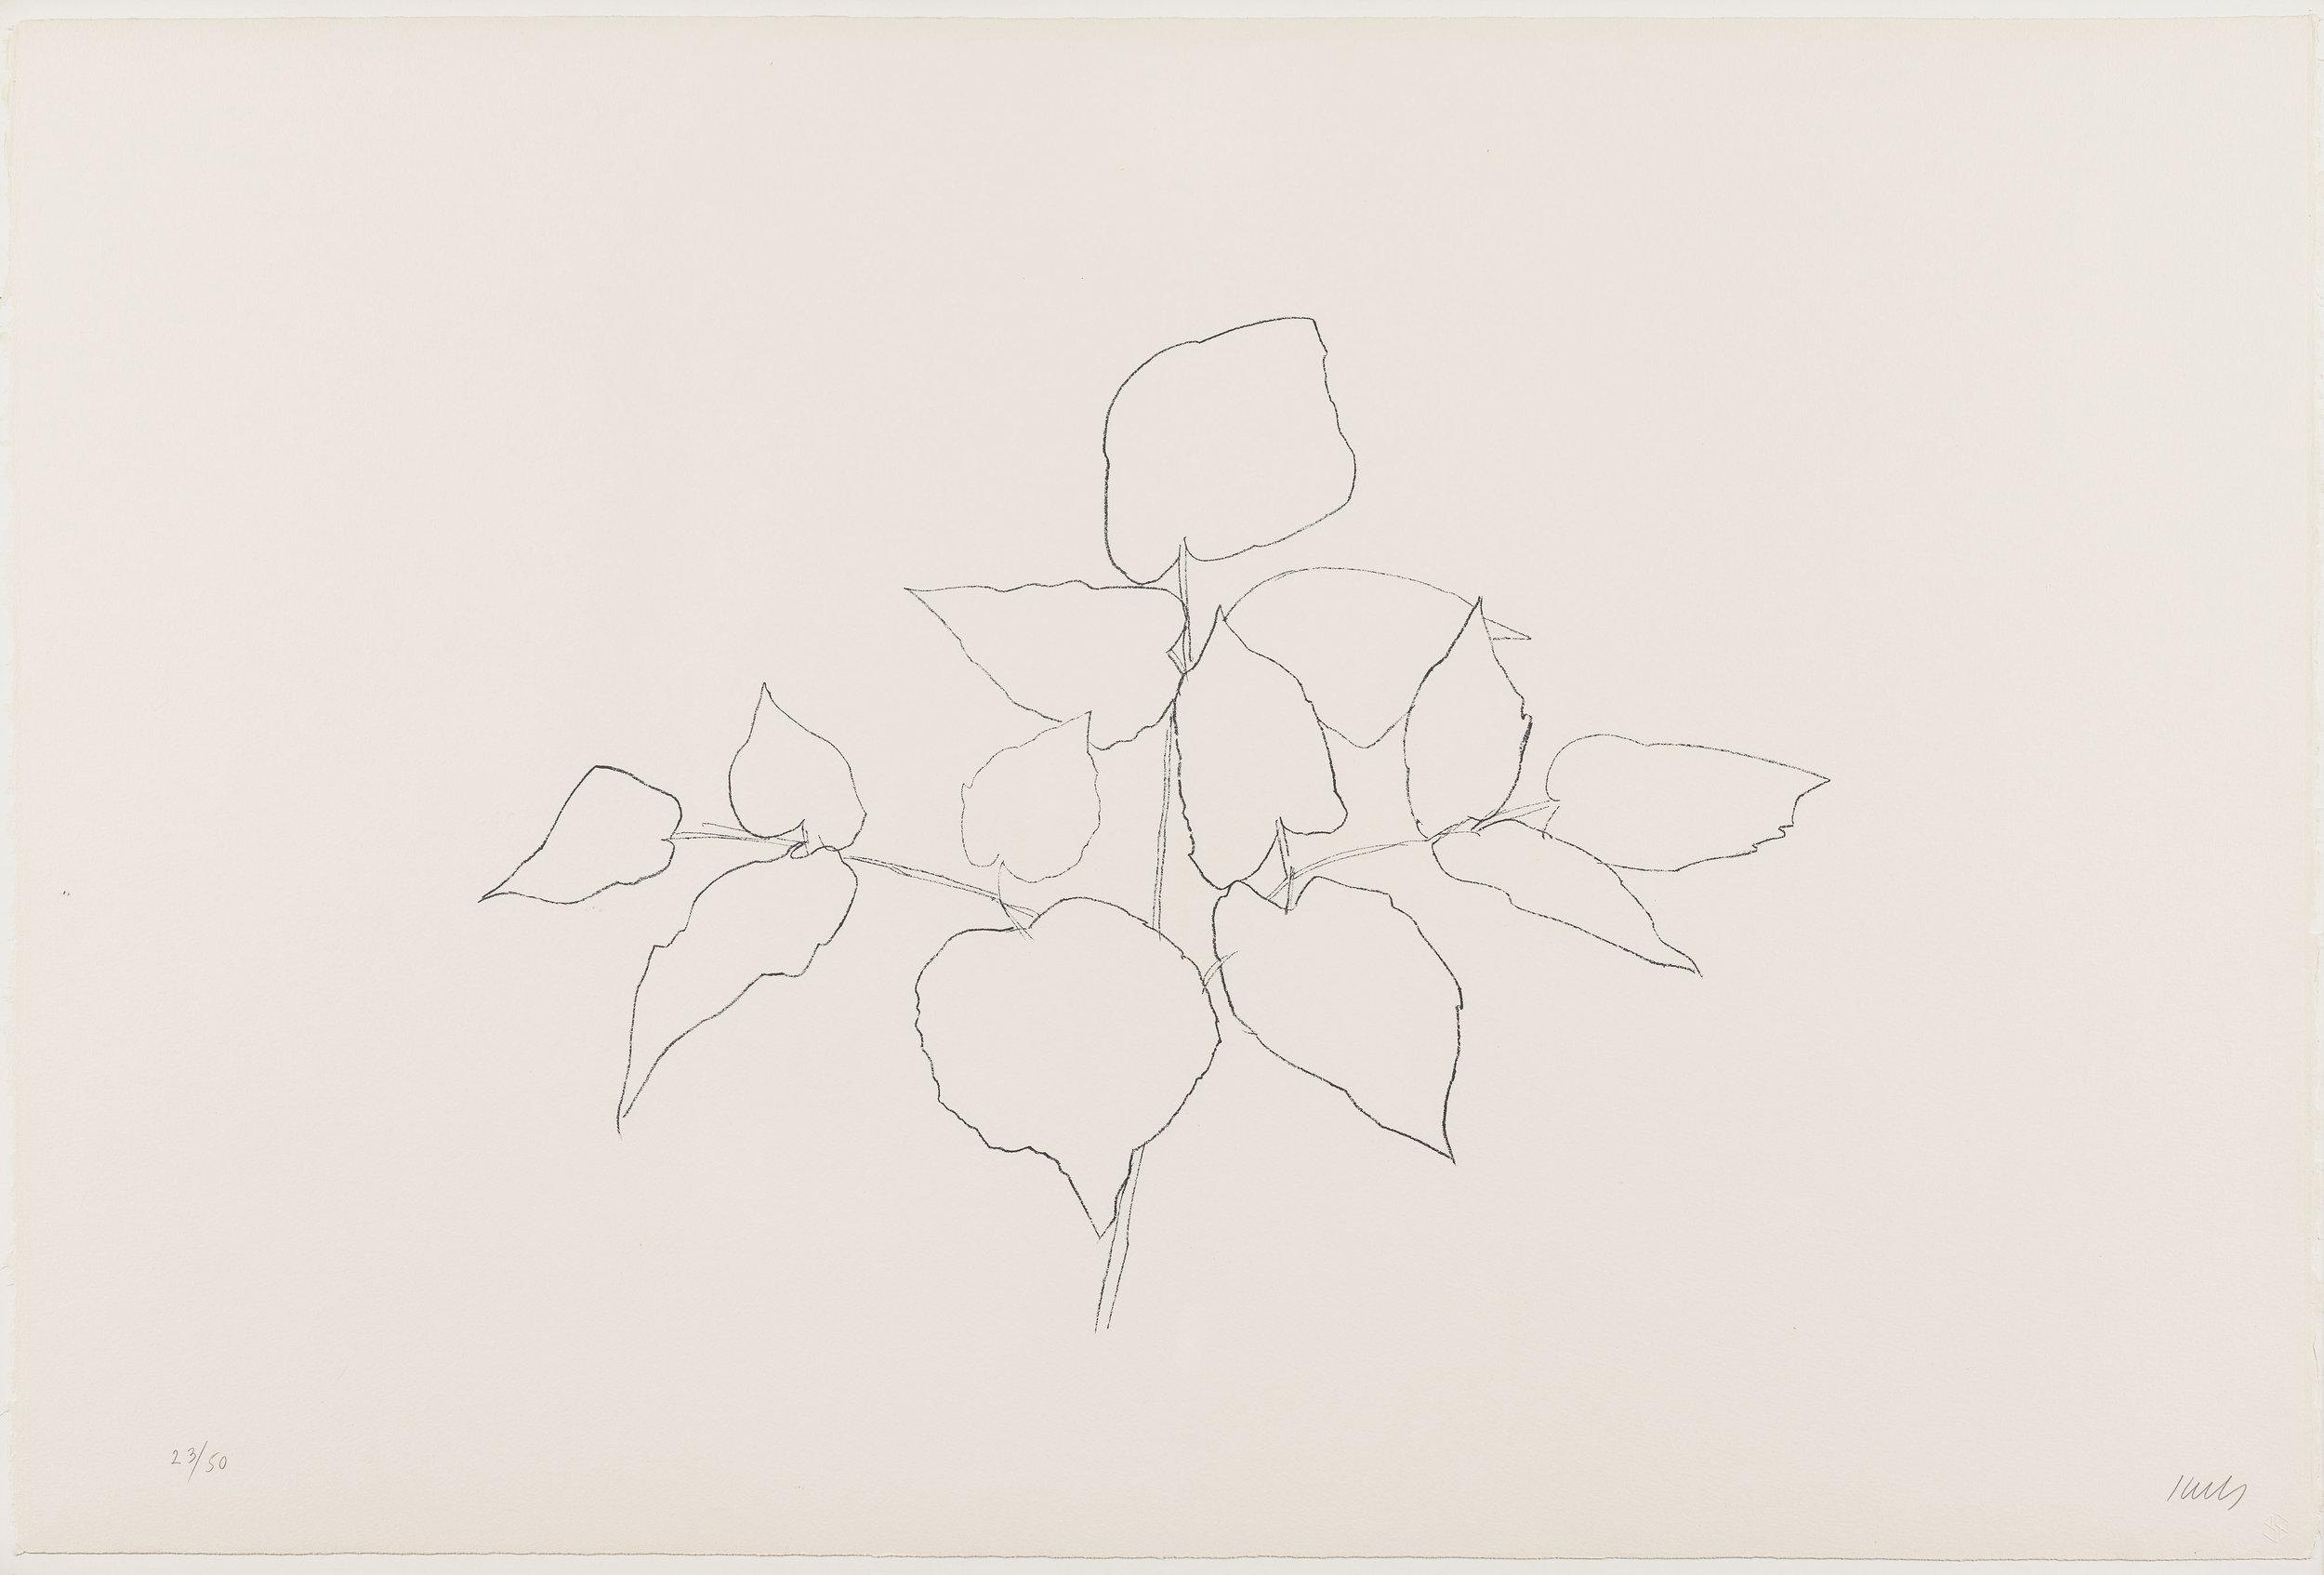 Ellsworth Kelly  (1923-2015)  Sarsaparilla (or Ailanthus Leaves) , 1979-80 Transfer lithograph 31 1/2 x 47 inches